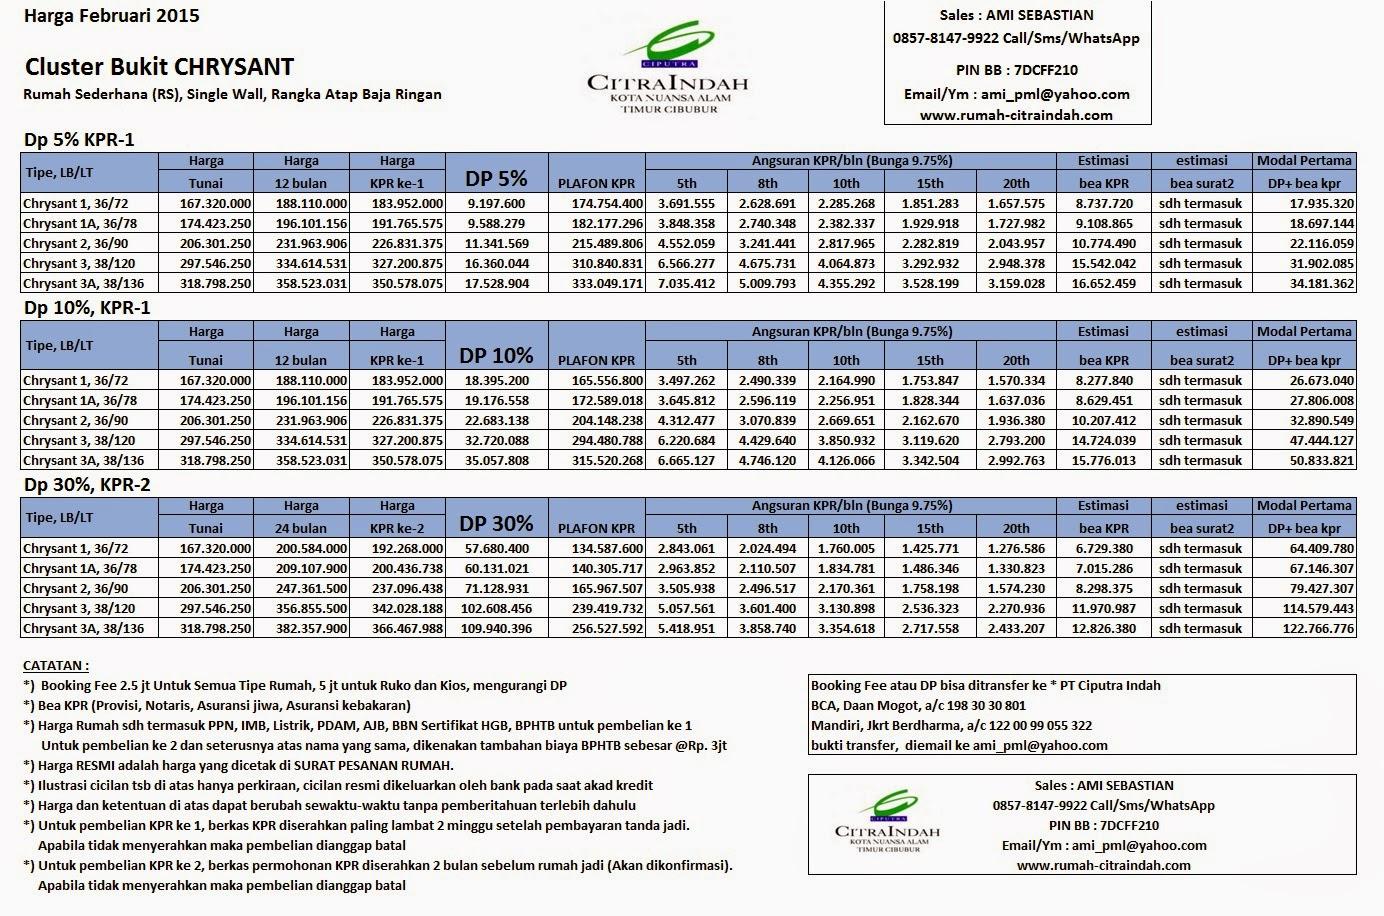 harga-chrysant-citra-indah-2015